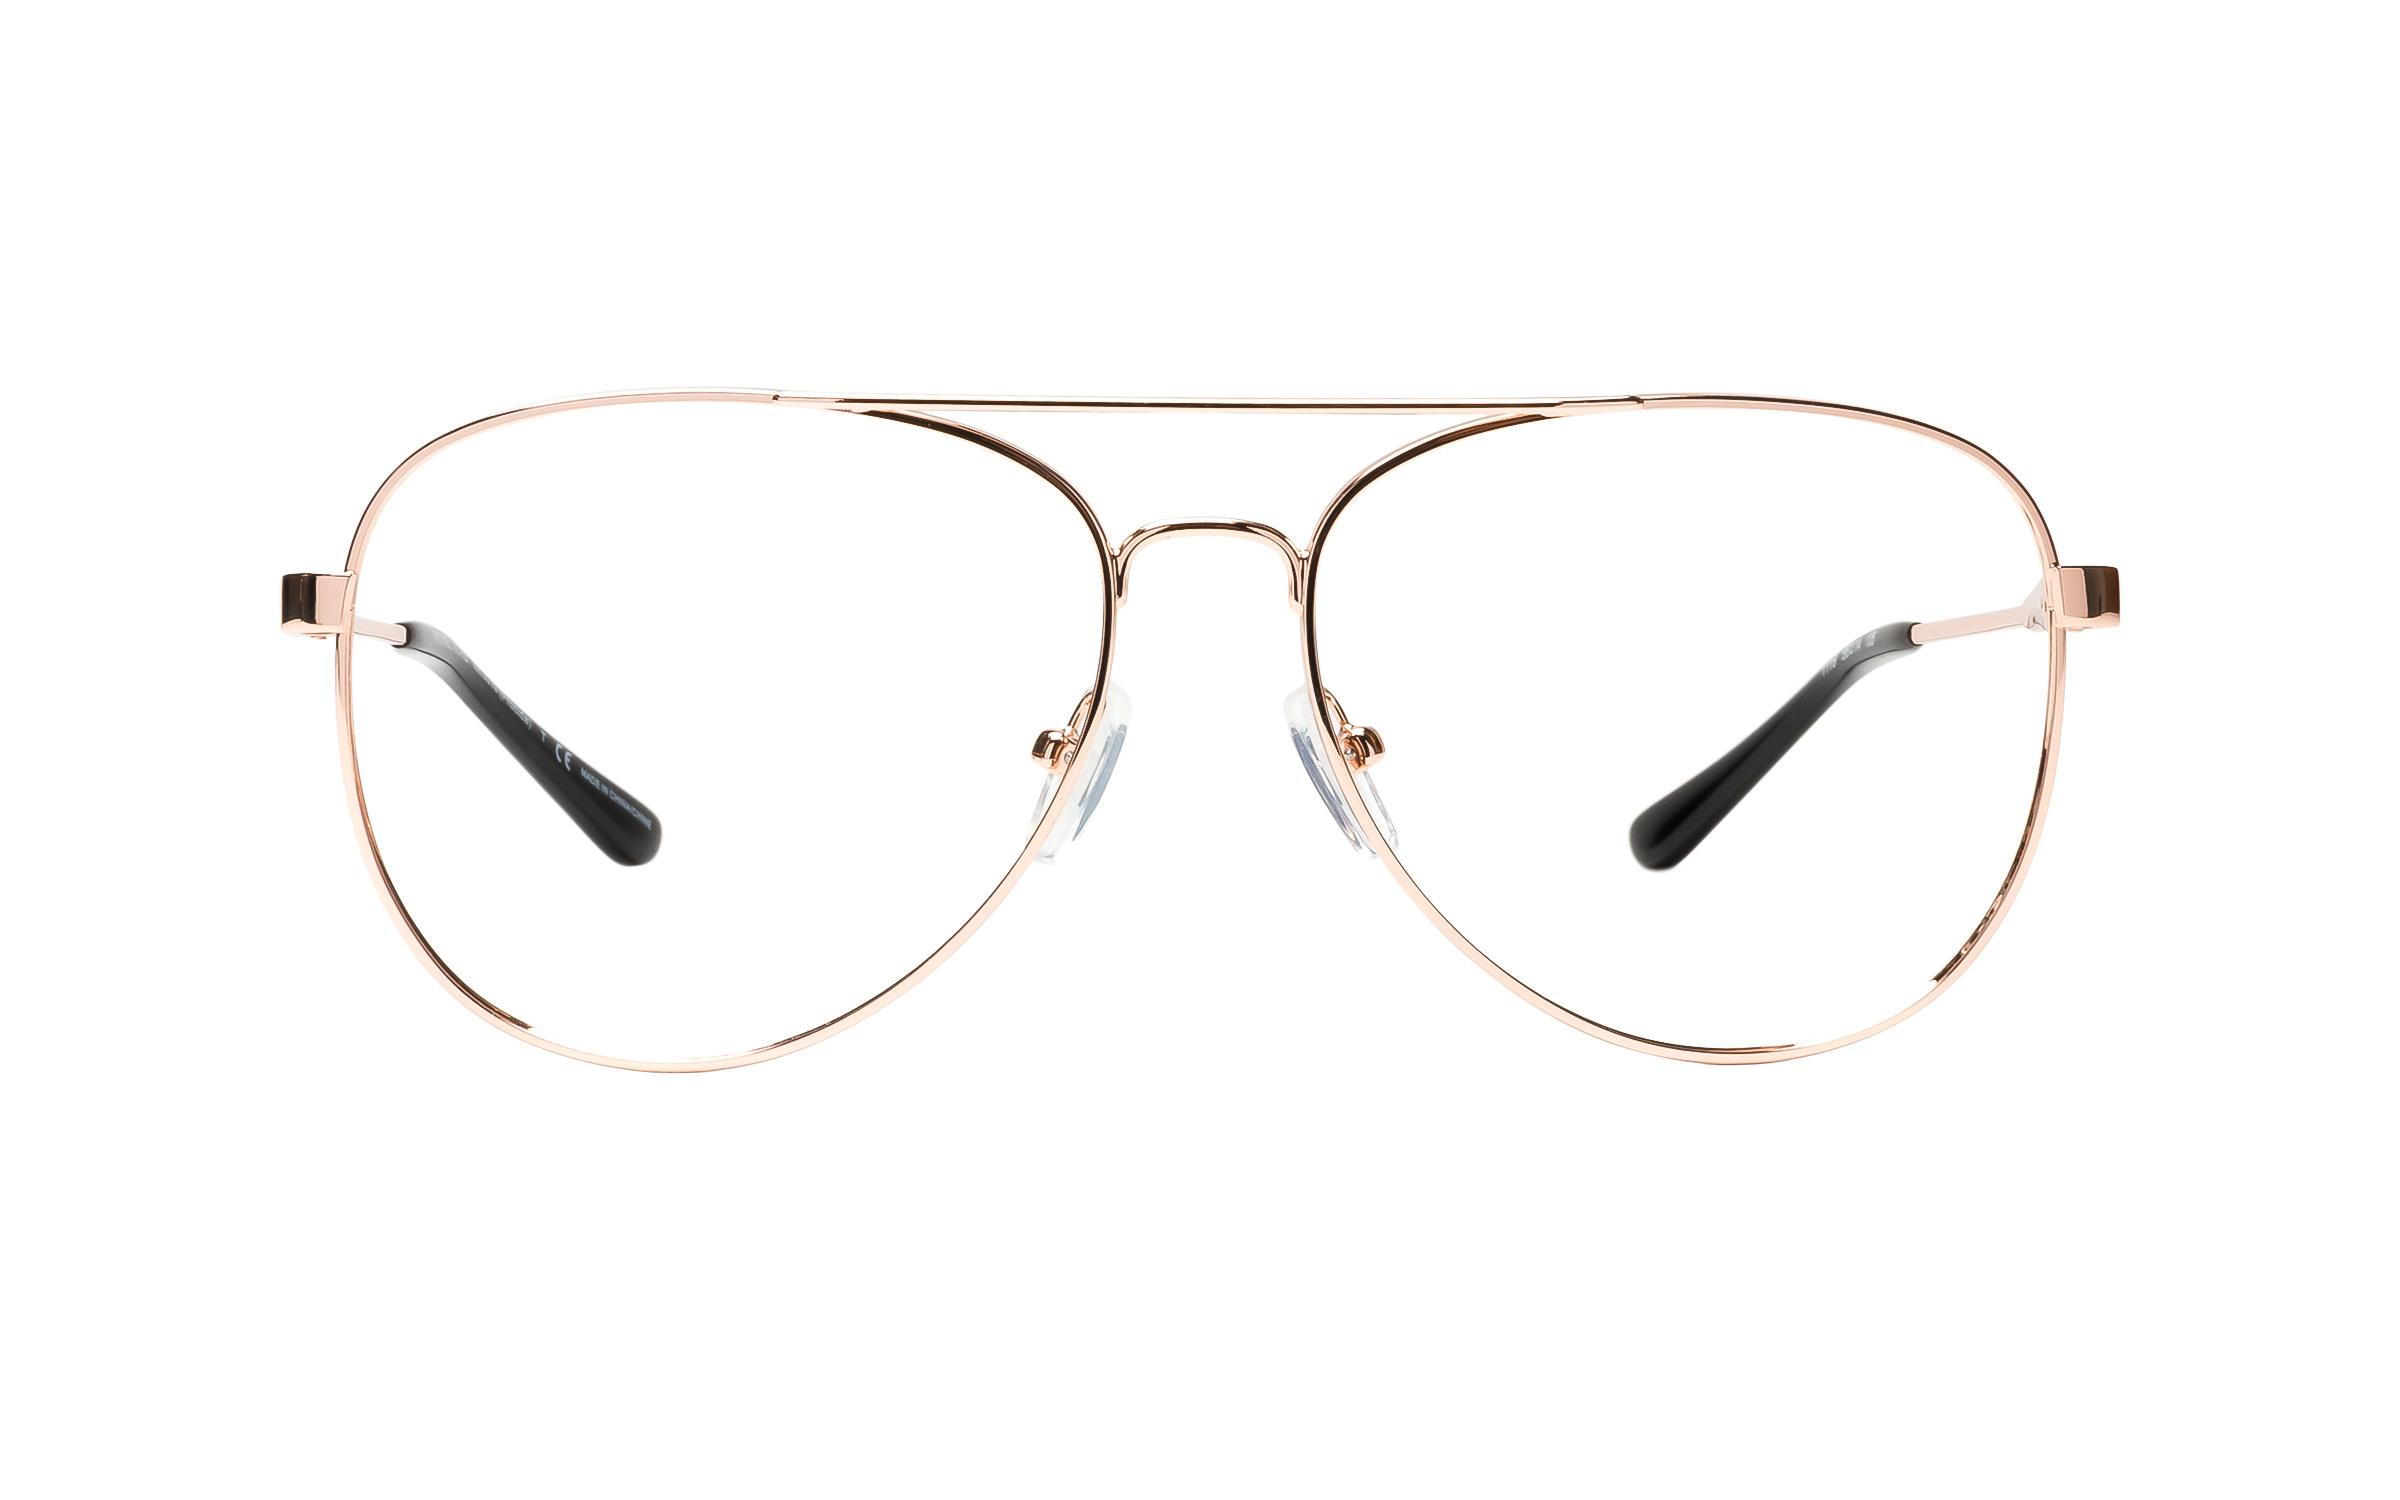 Michael Kors MK3019 1116 (56) Eyeglasses and Frame in Rose Gold/Pink | Plastic/Metal - Online